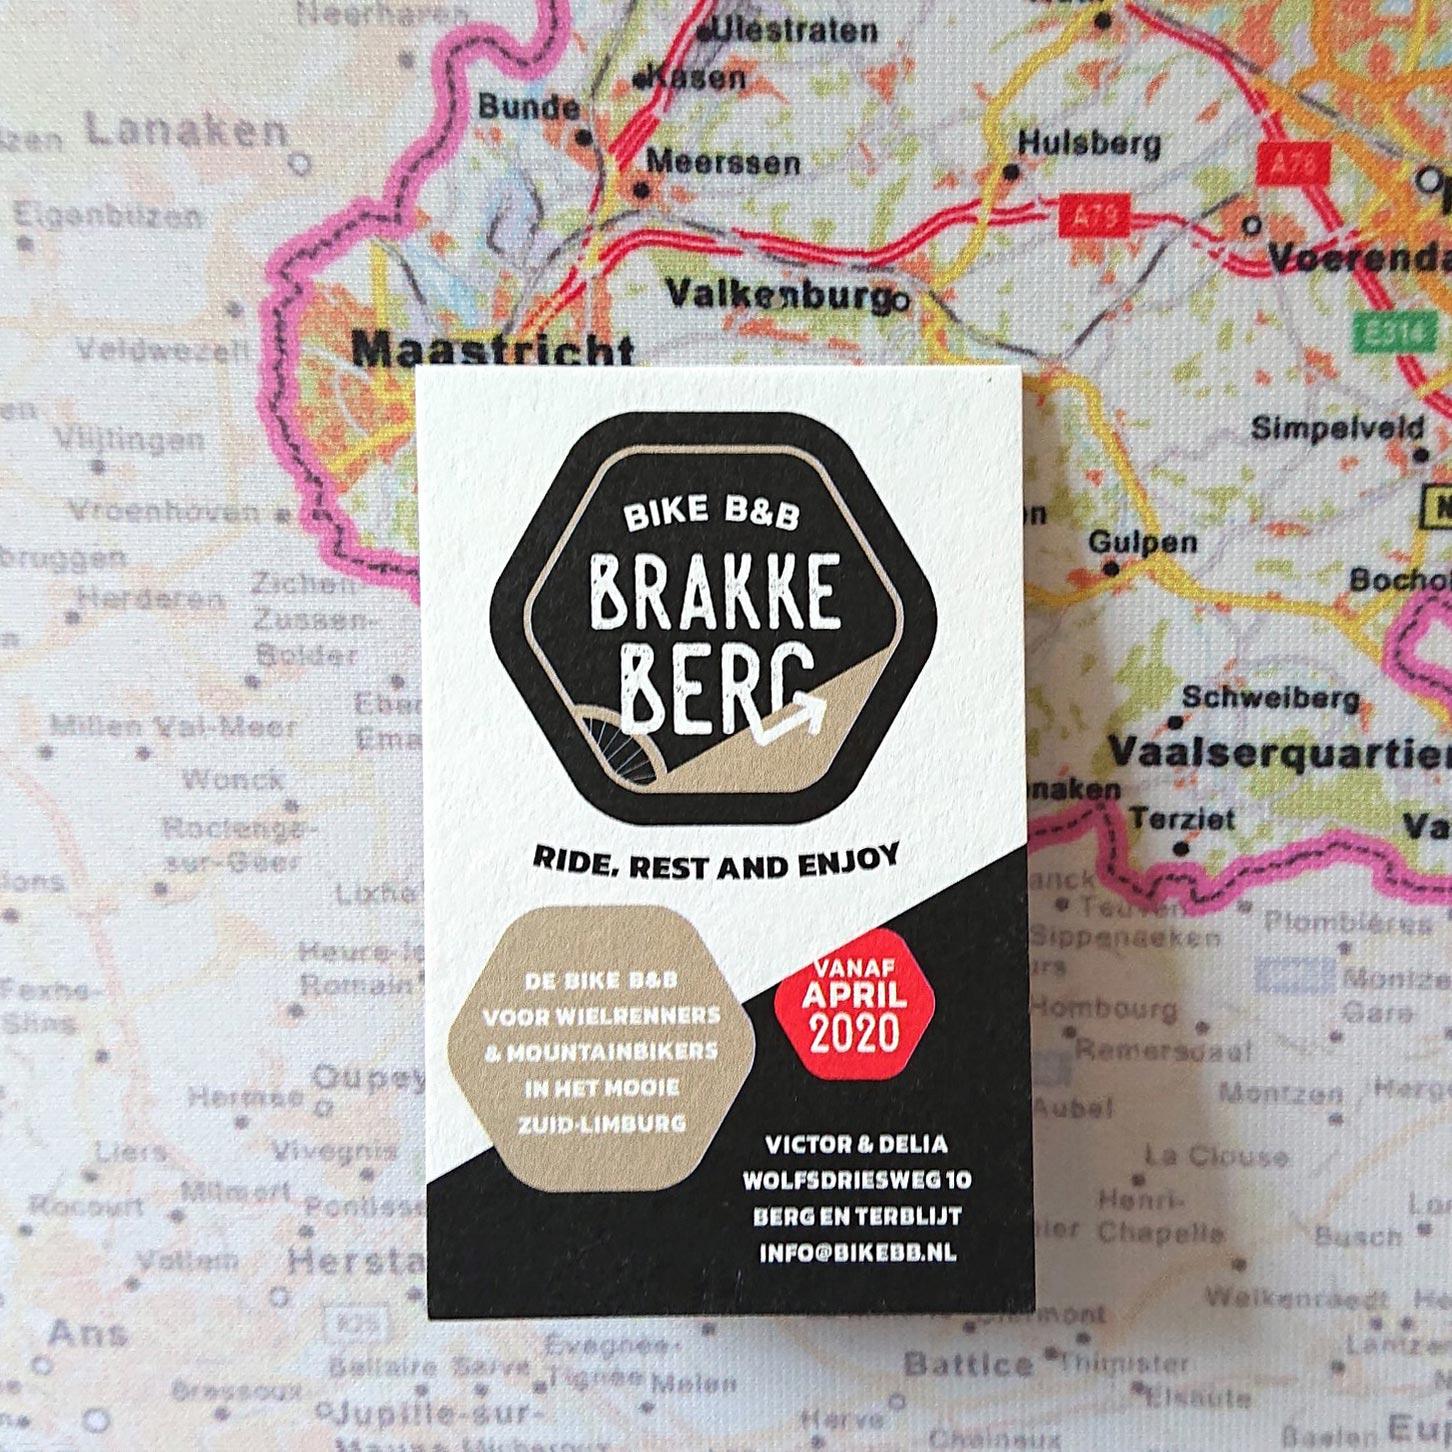 visitekaartje Bike B&B Brakke Berg